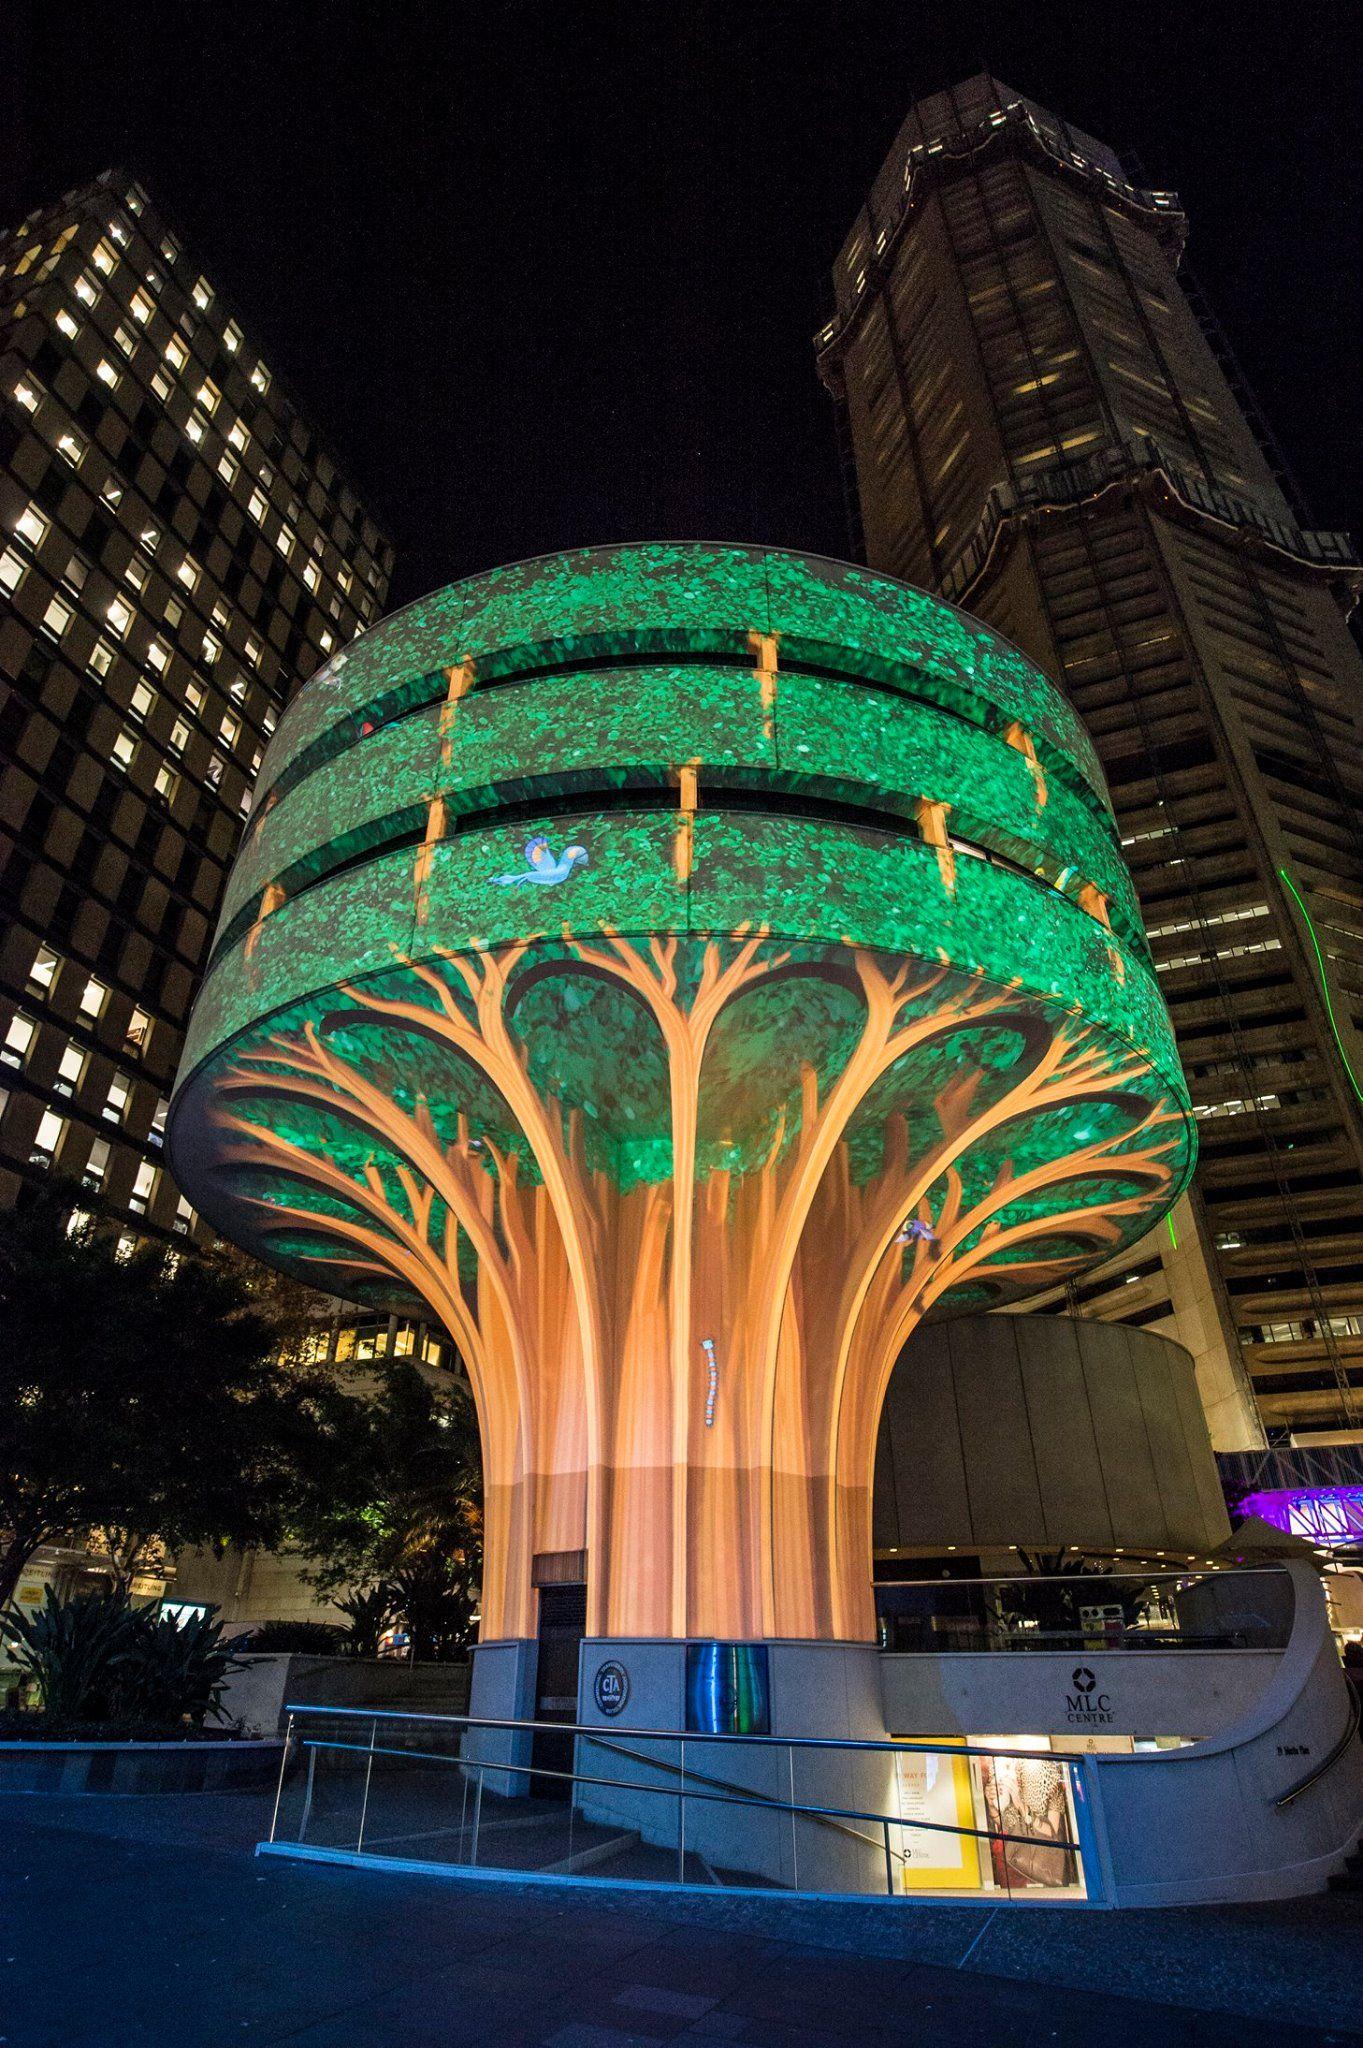 Downtown Sydney Transformed by Light for Vivid Sydney  Sydney projection light exhibition